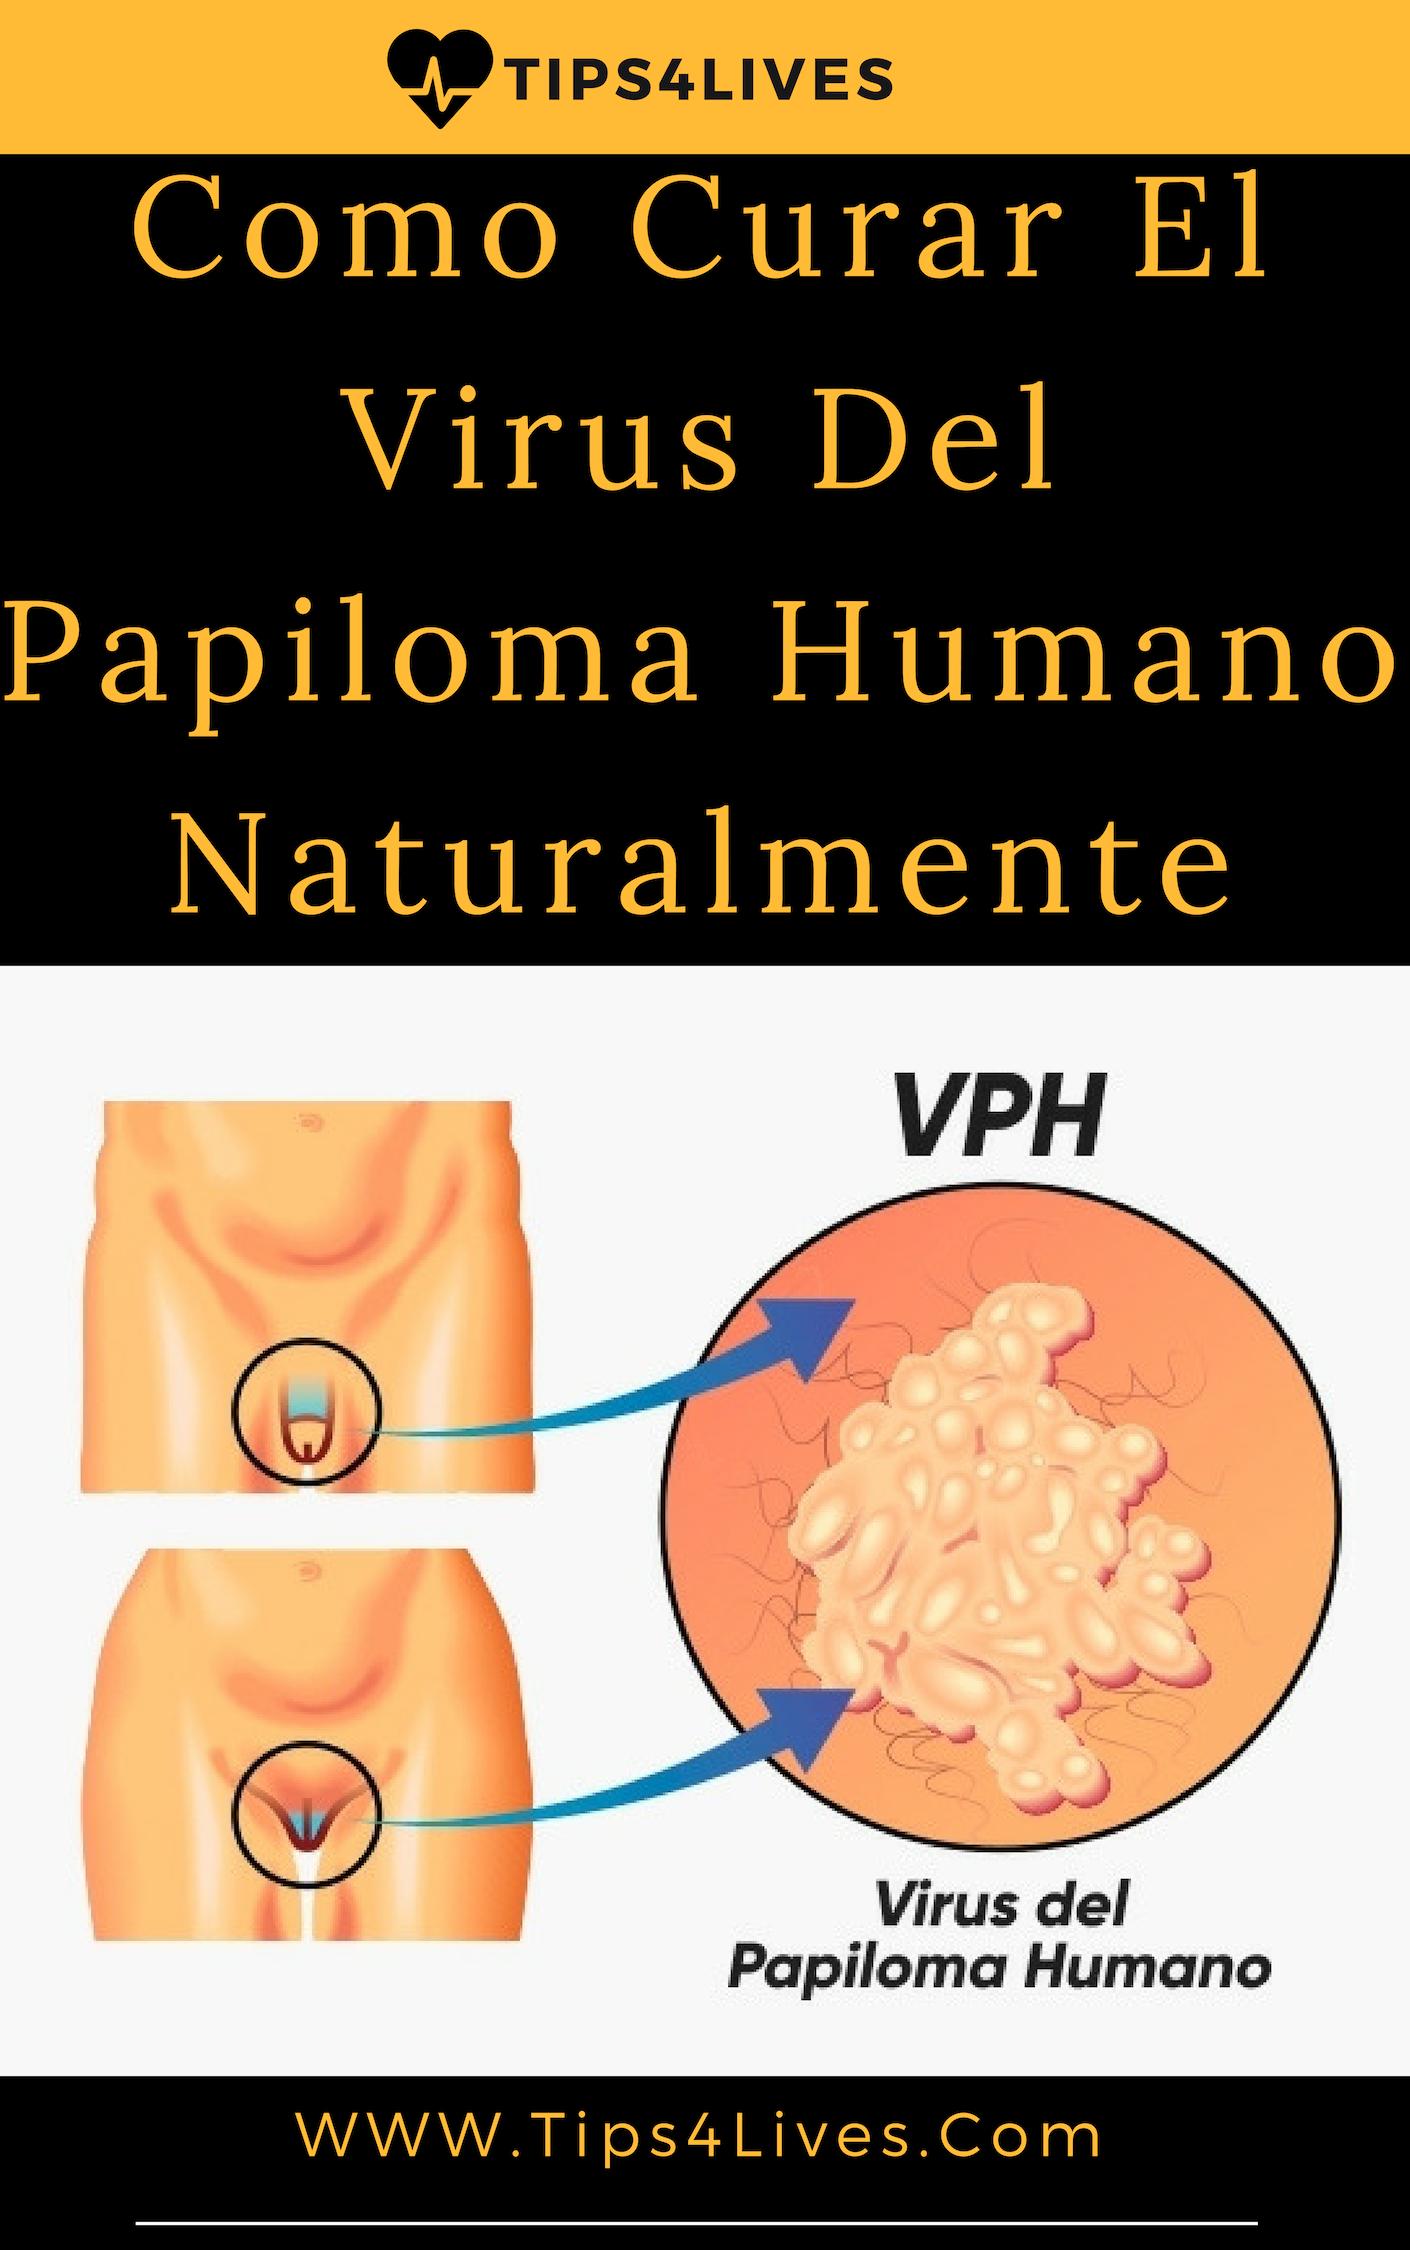 papilloma virus si cura